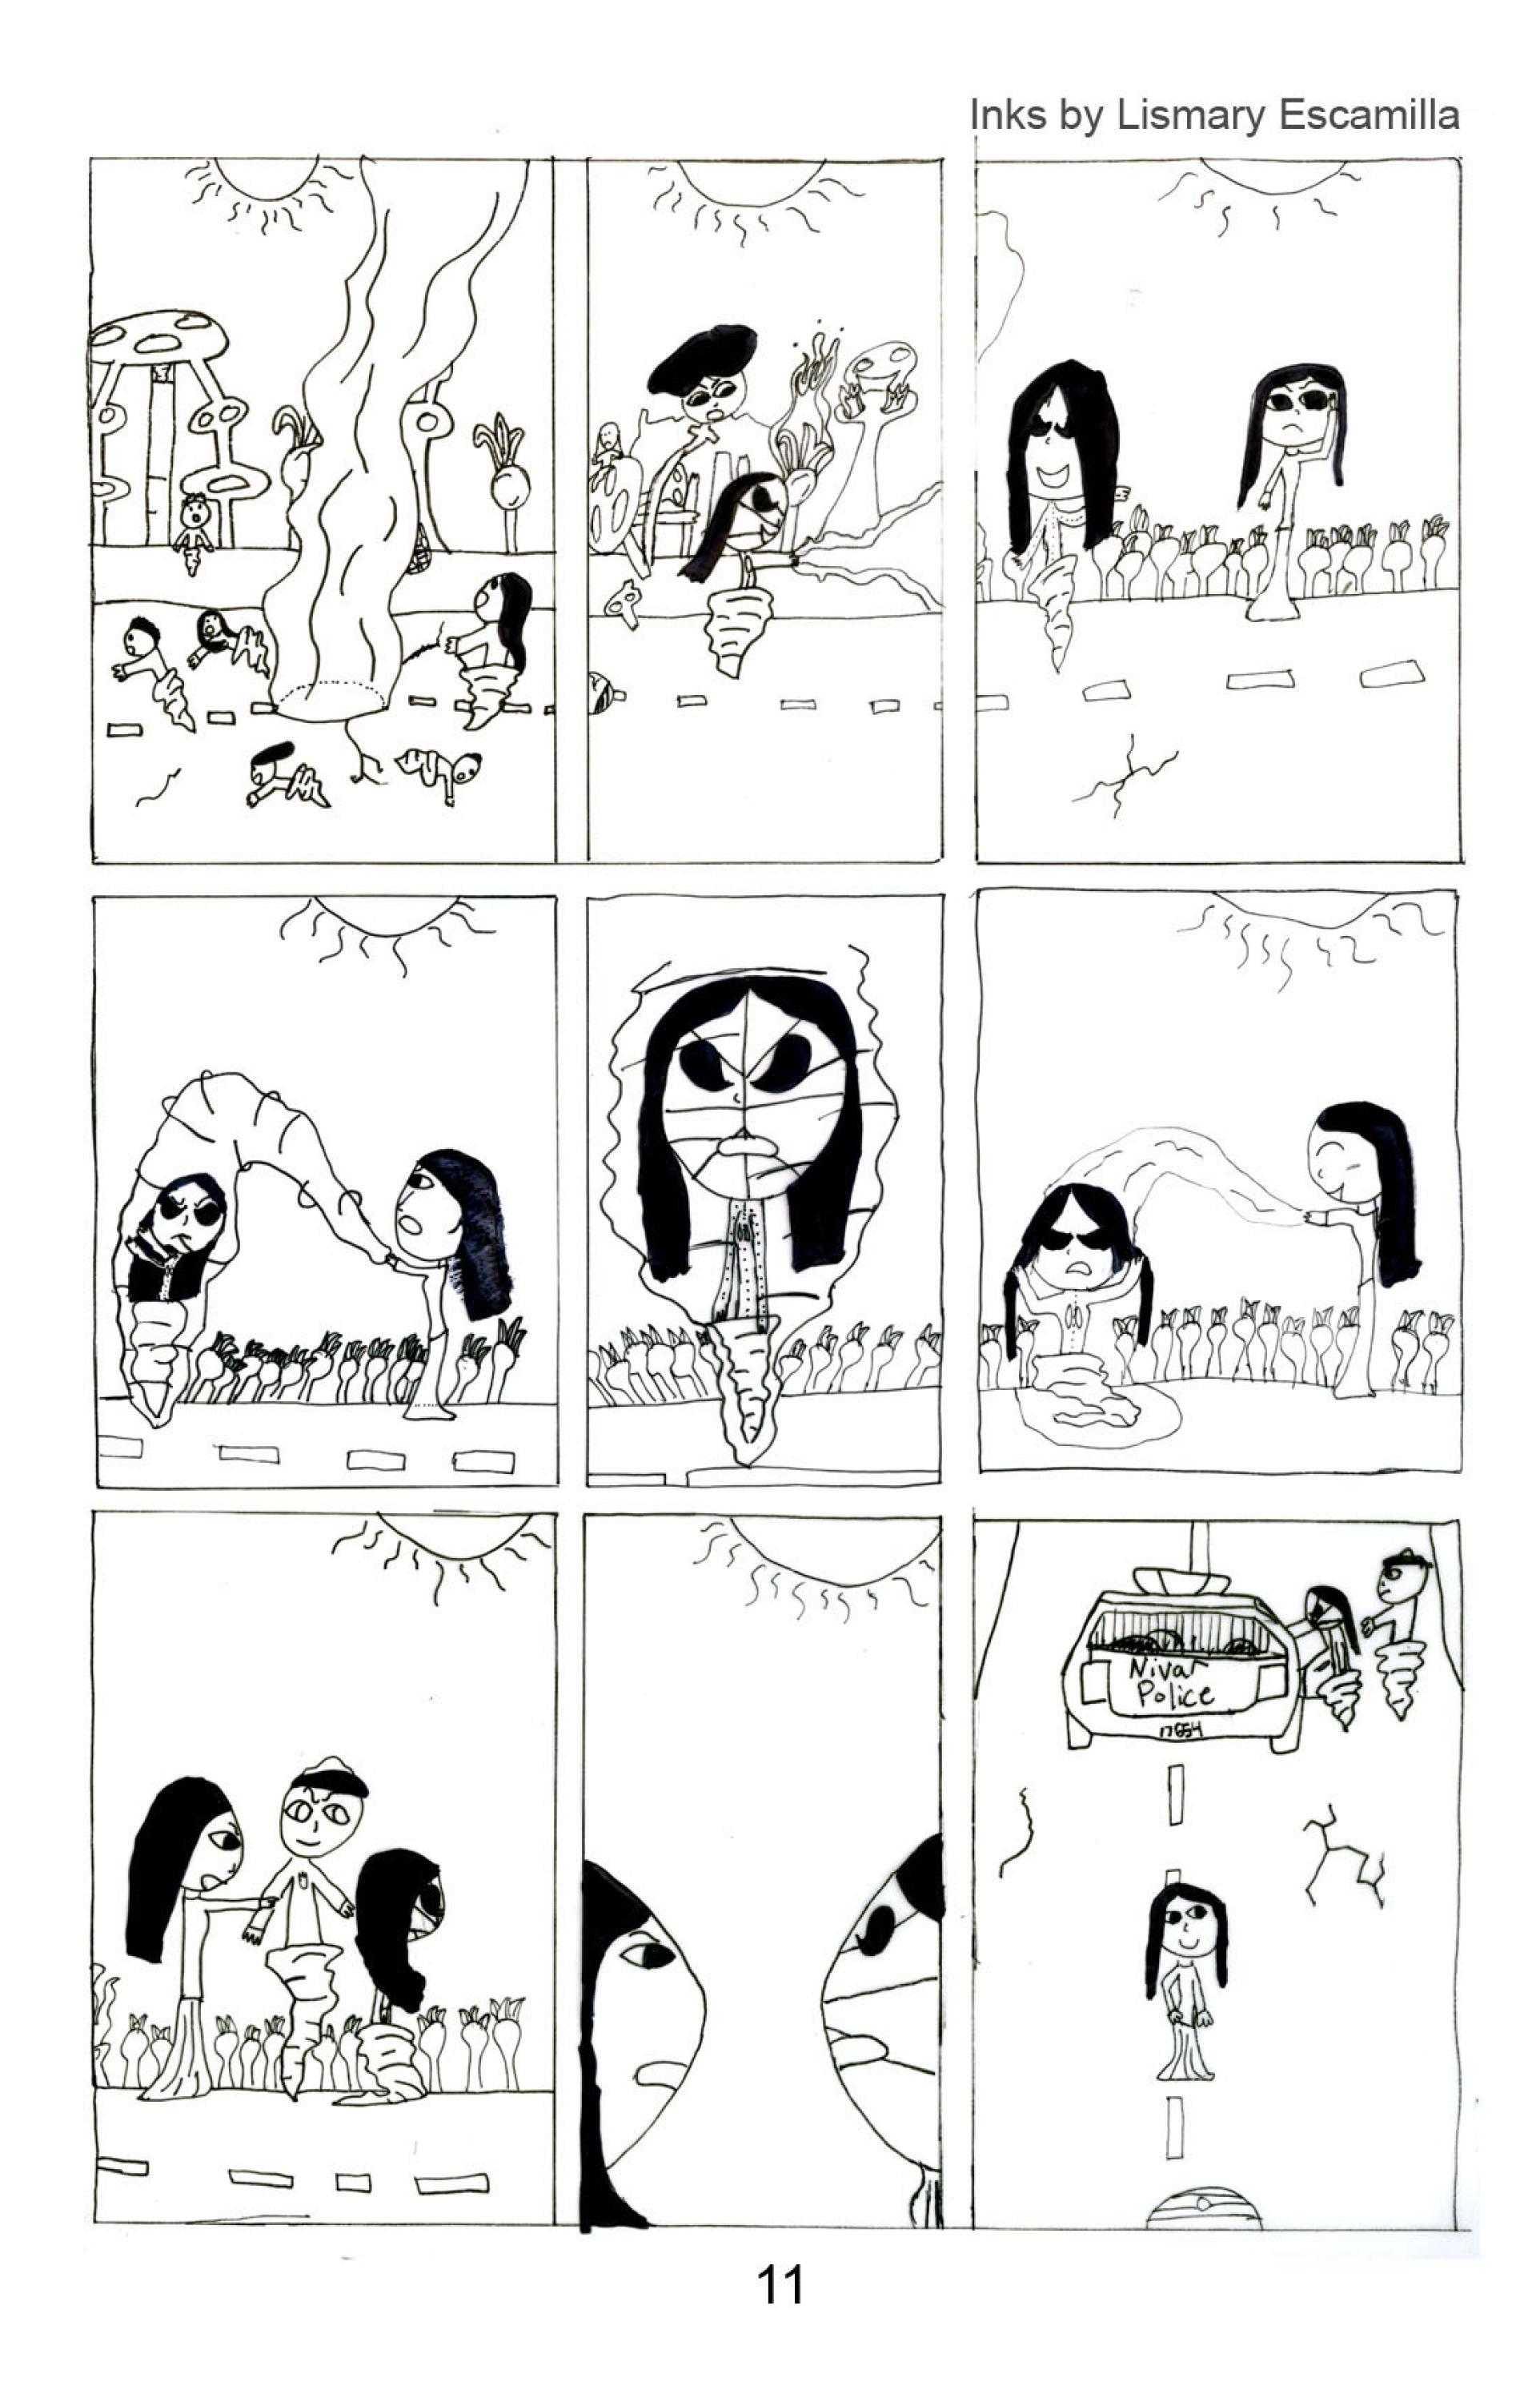 ev page 11.jpg